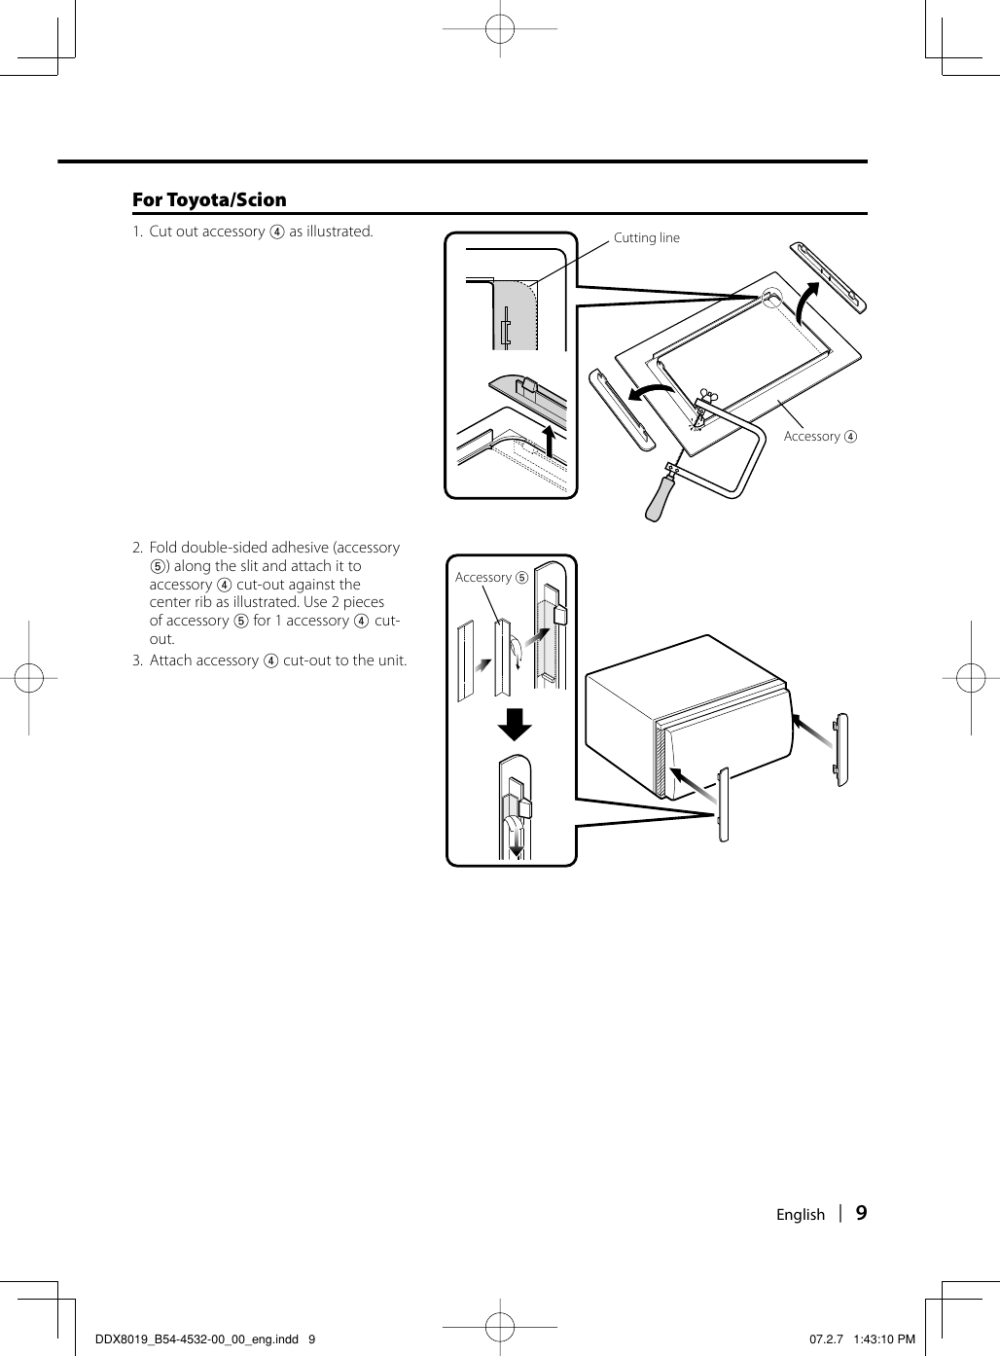 medium resolution of page 9 of 12 kenwood kenwood excelon ddx8019 users manual